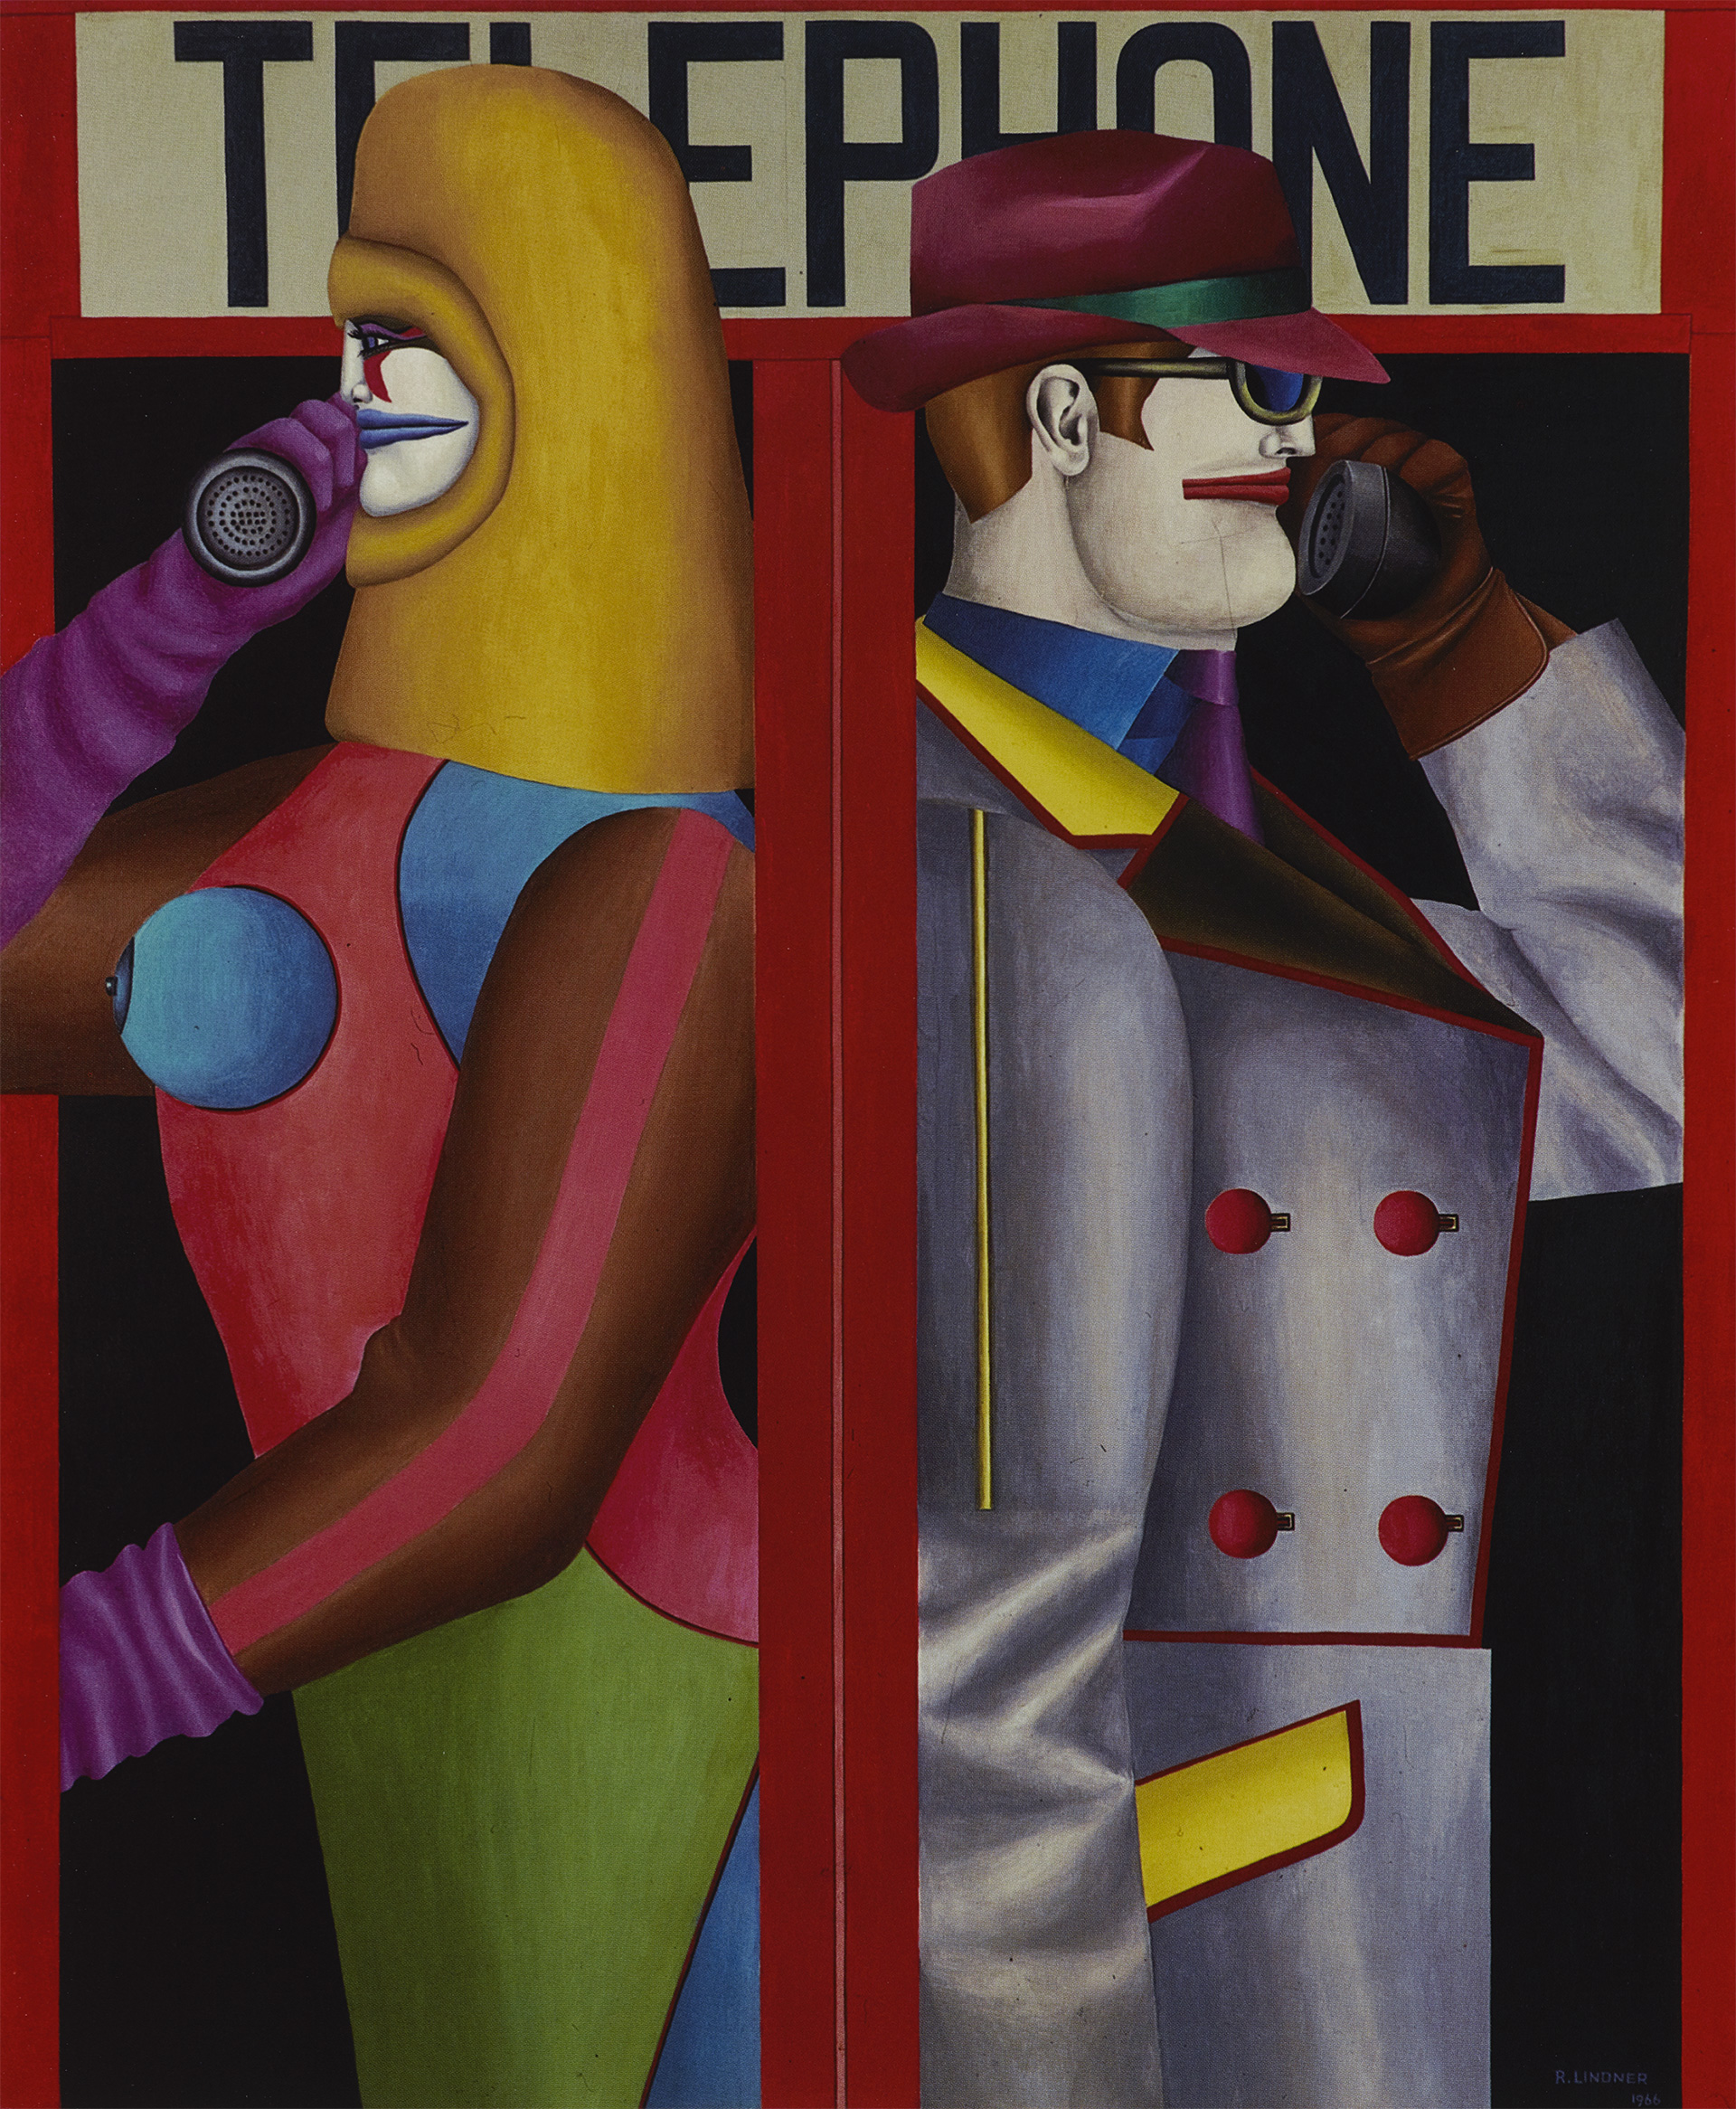 Telephone, 1966 grand format